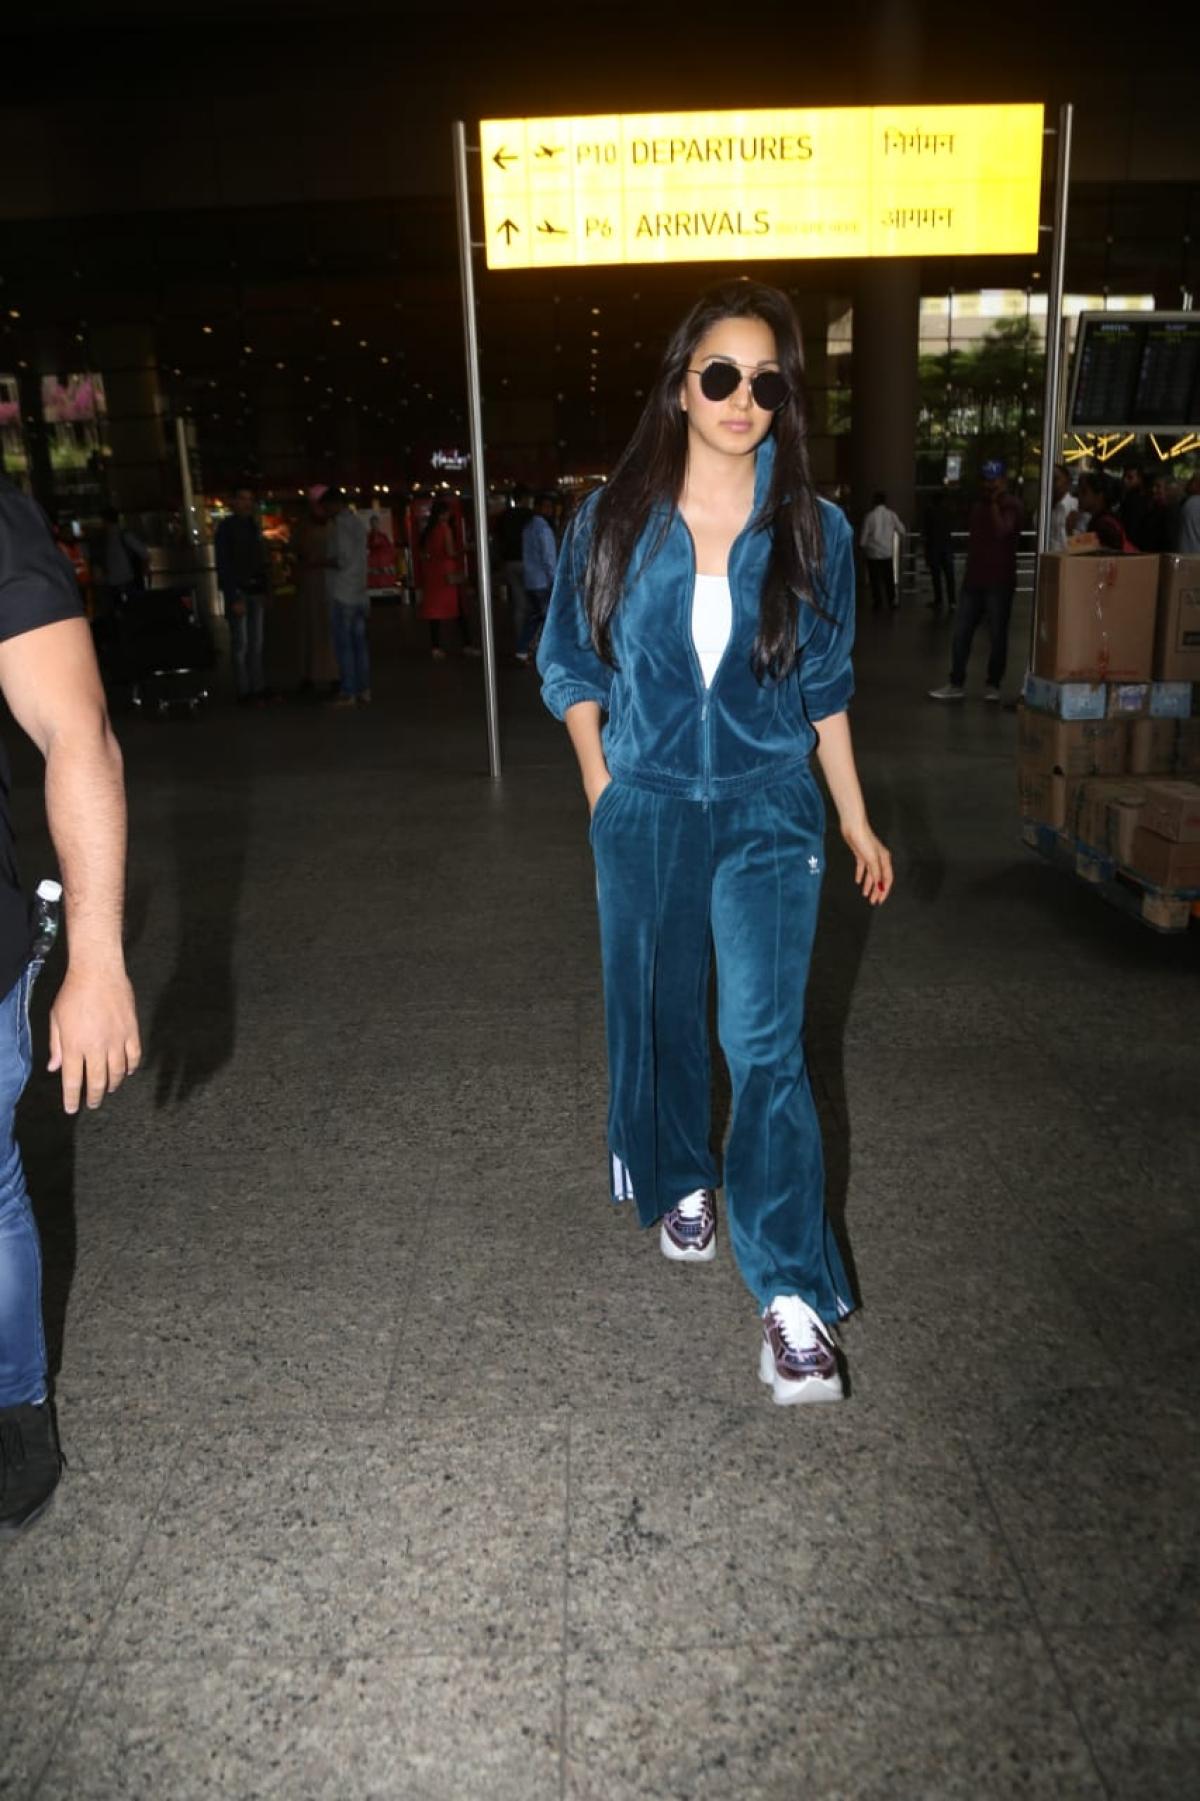 Kiara Advani's dapper airport look will make your heart skip a beat